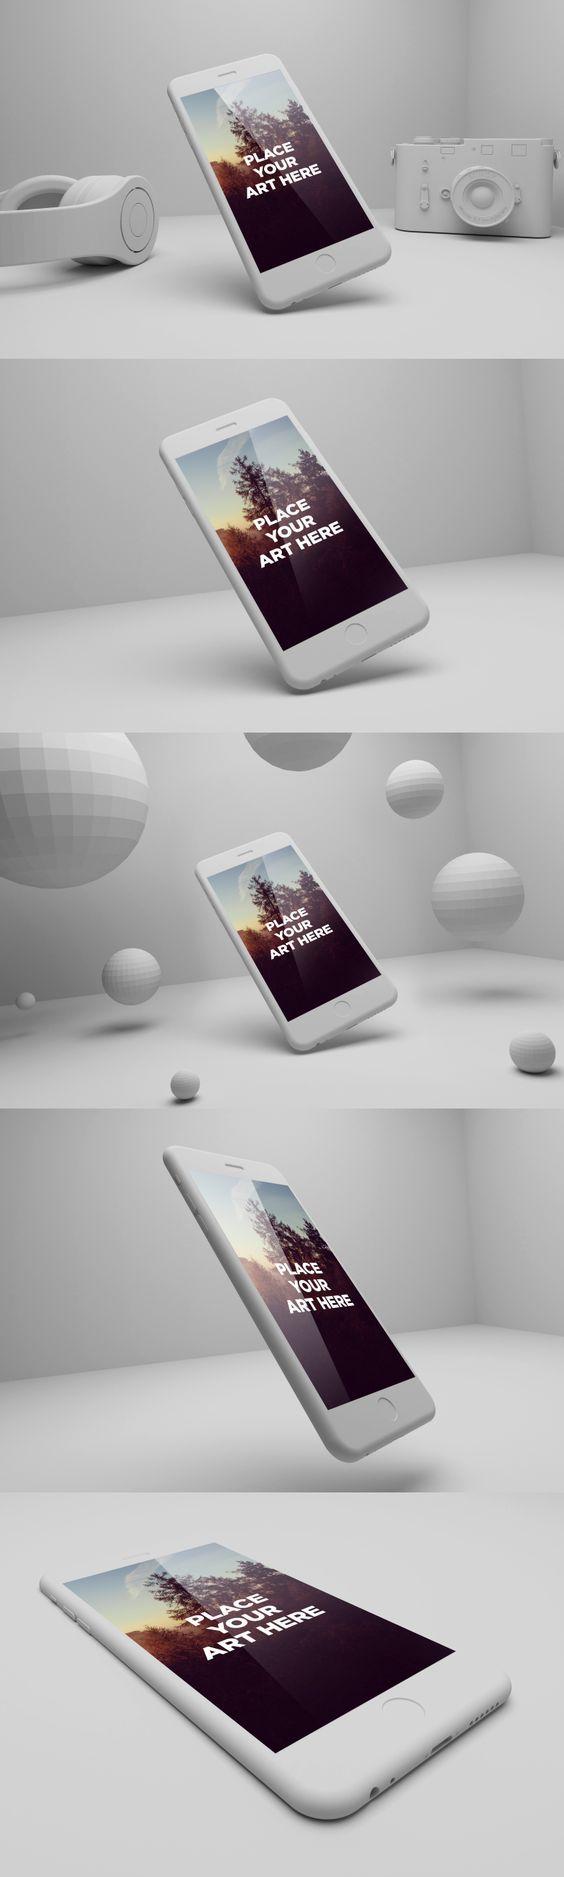 New FREE iPhone 6 PSD Playful Mockup Download free here: http://freegoodiesfordesigners.blogspot.se/2014/11/free-iphone-6-plus-playful-psd-mockups.html: